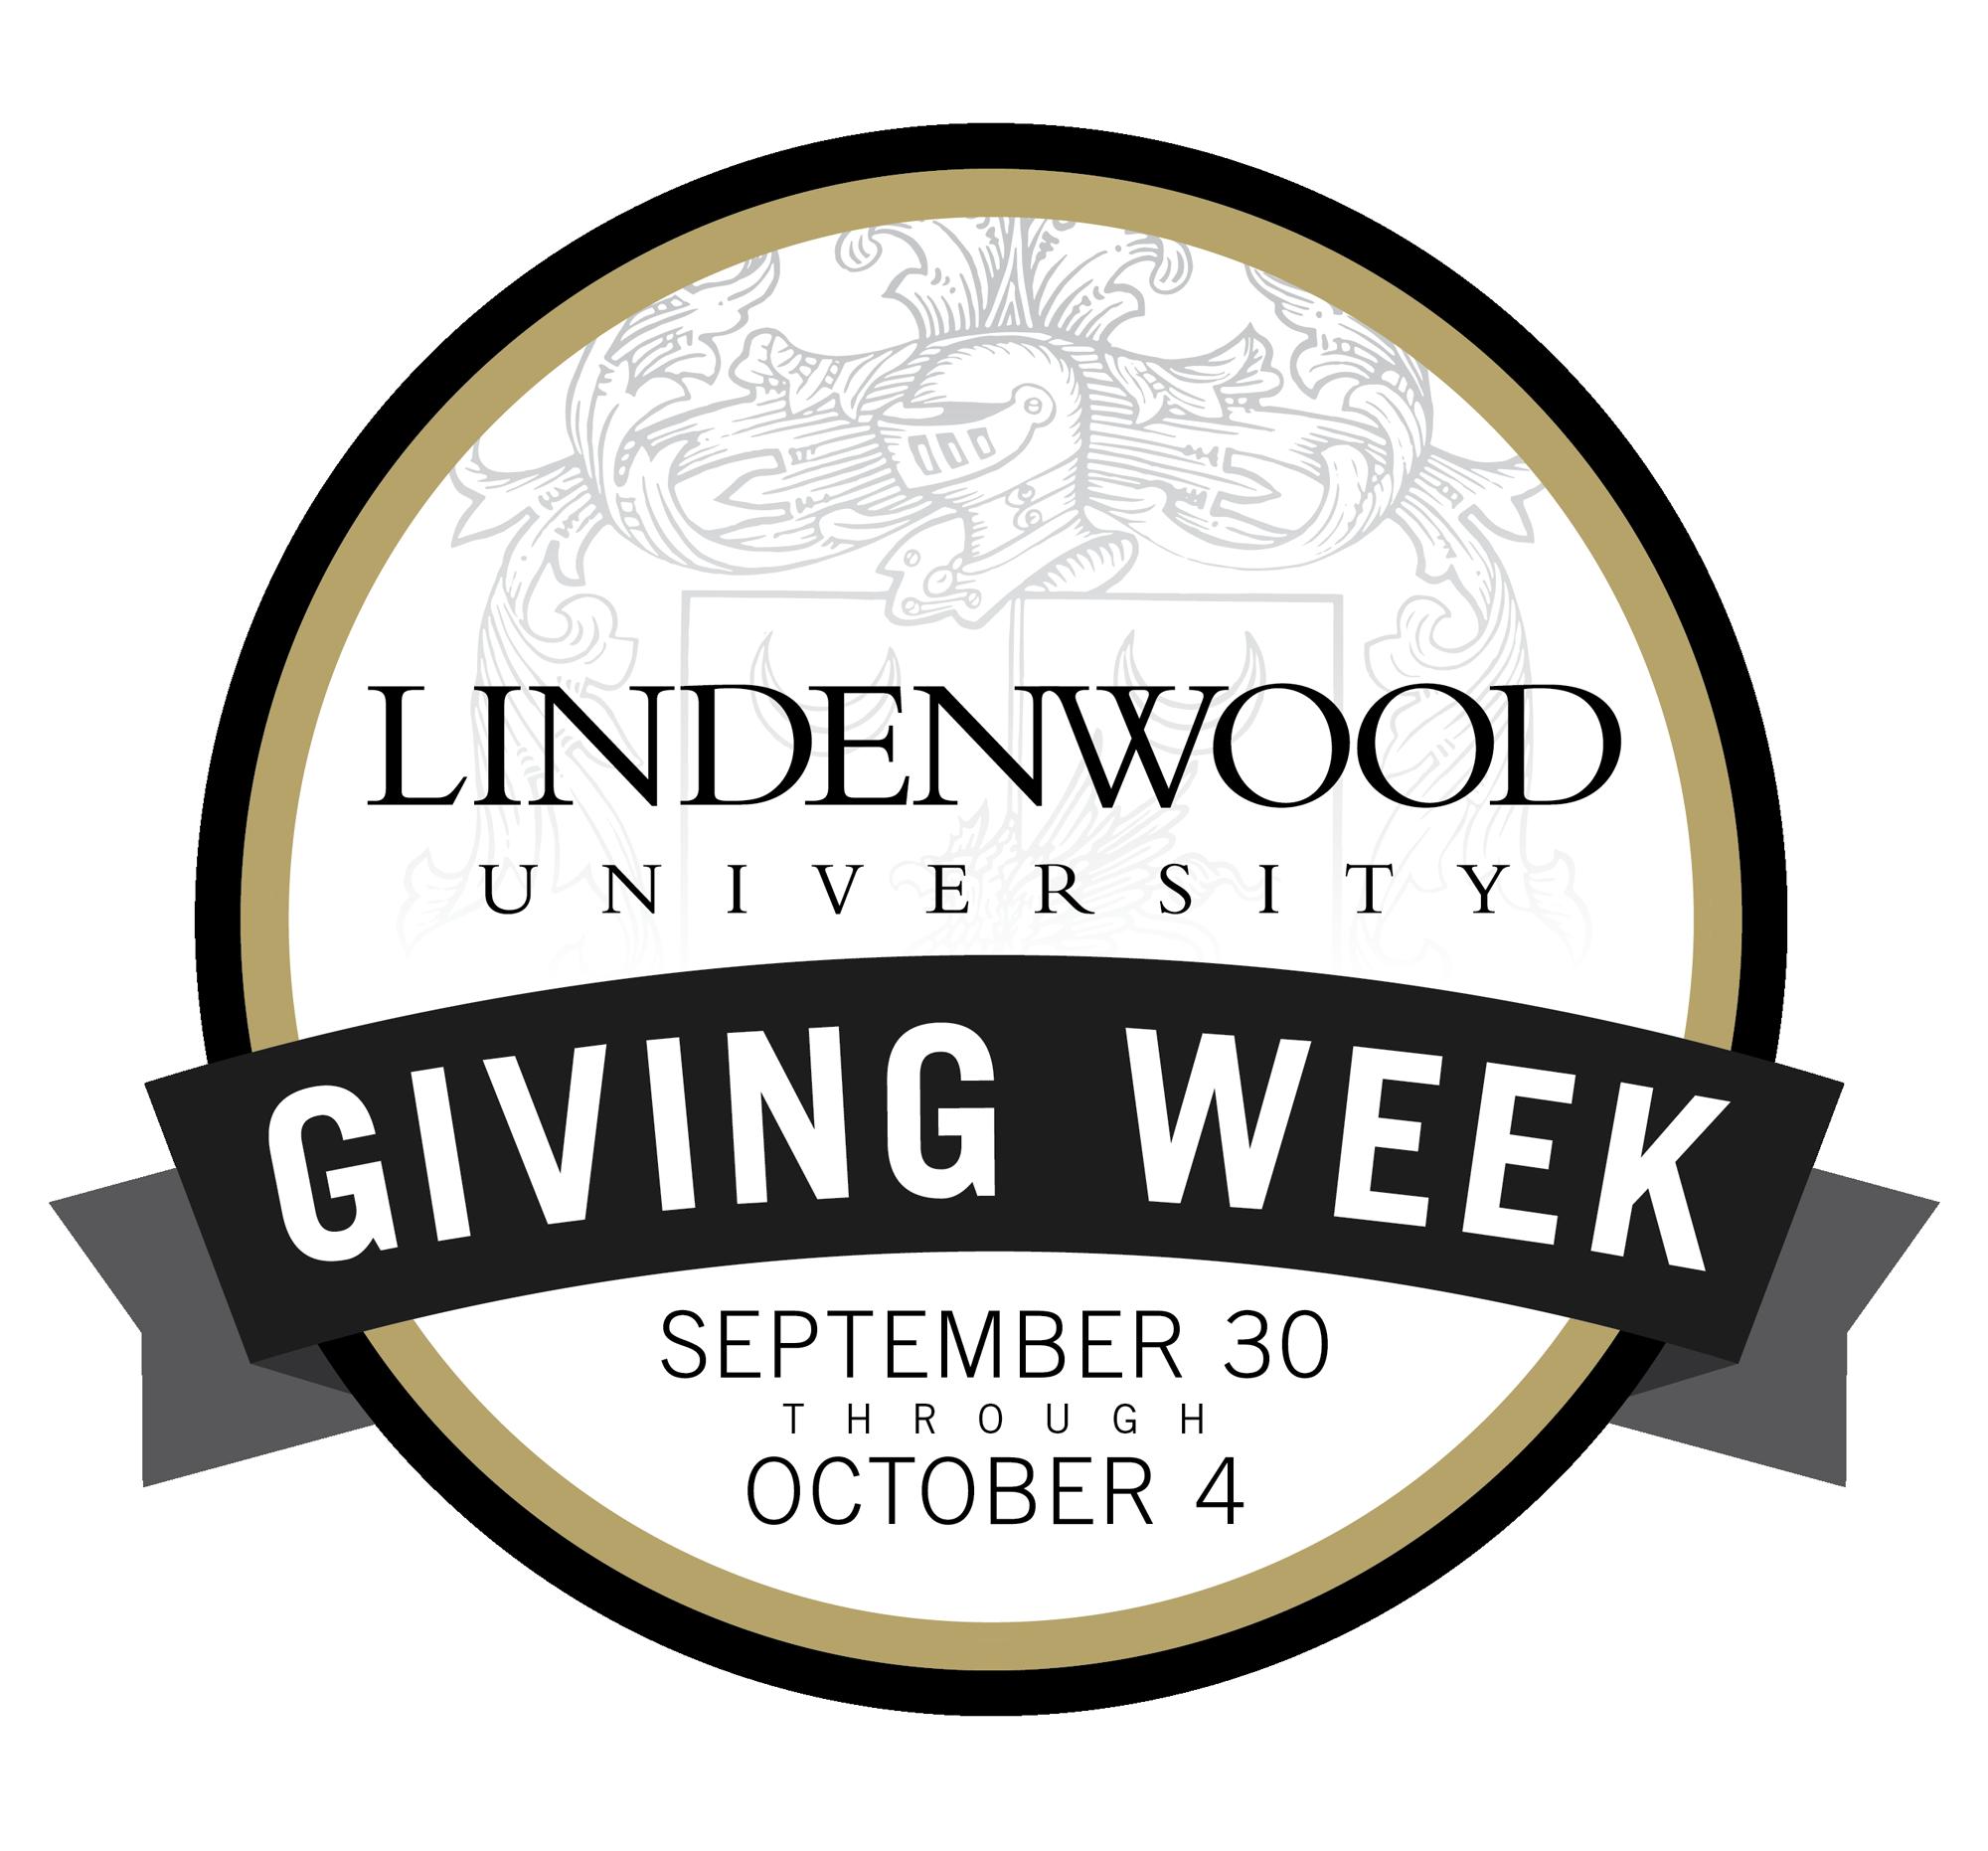 Giving Week 2019 - September 30 - October 4